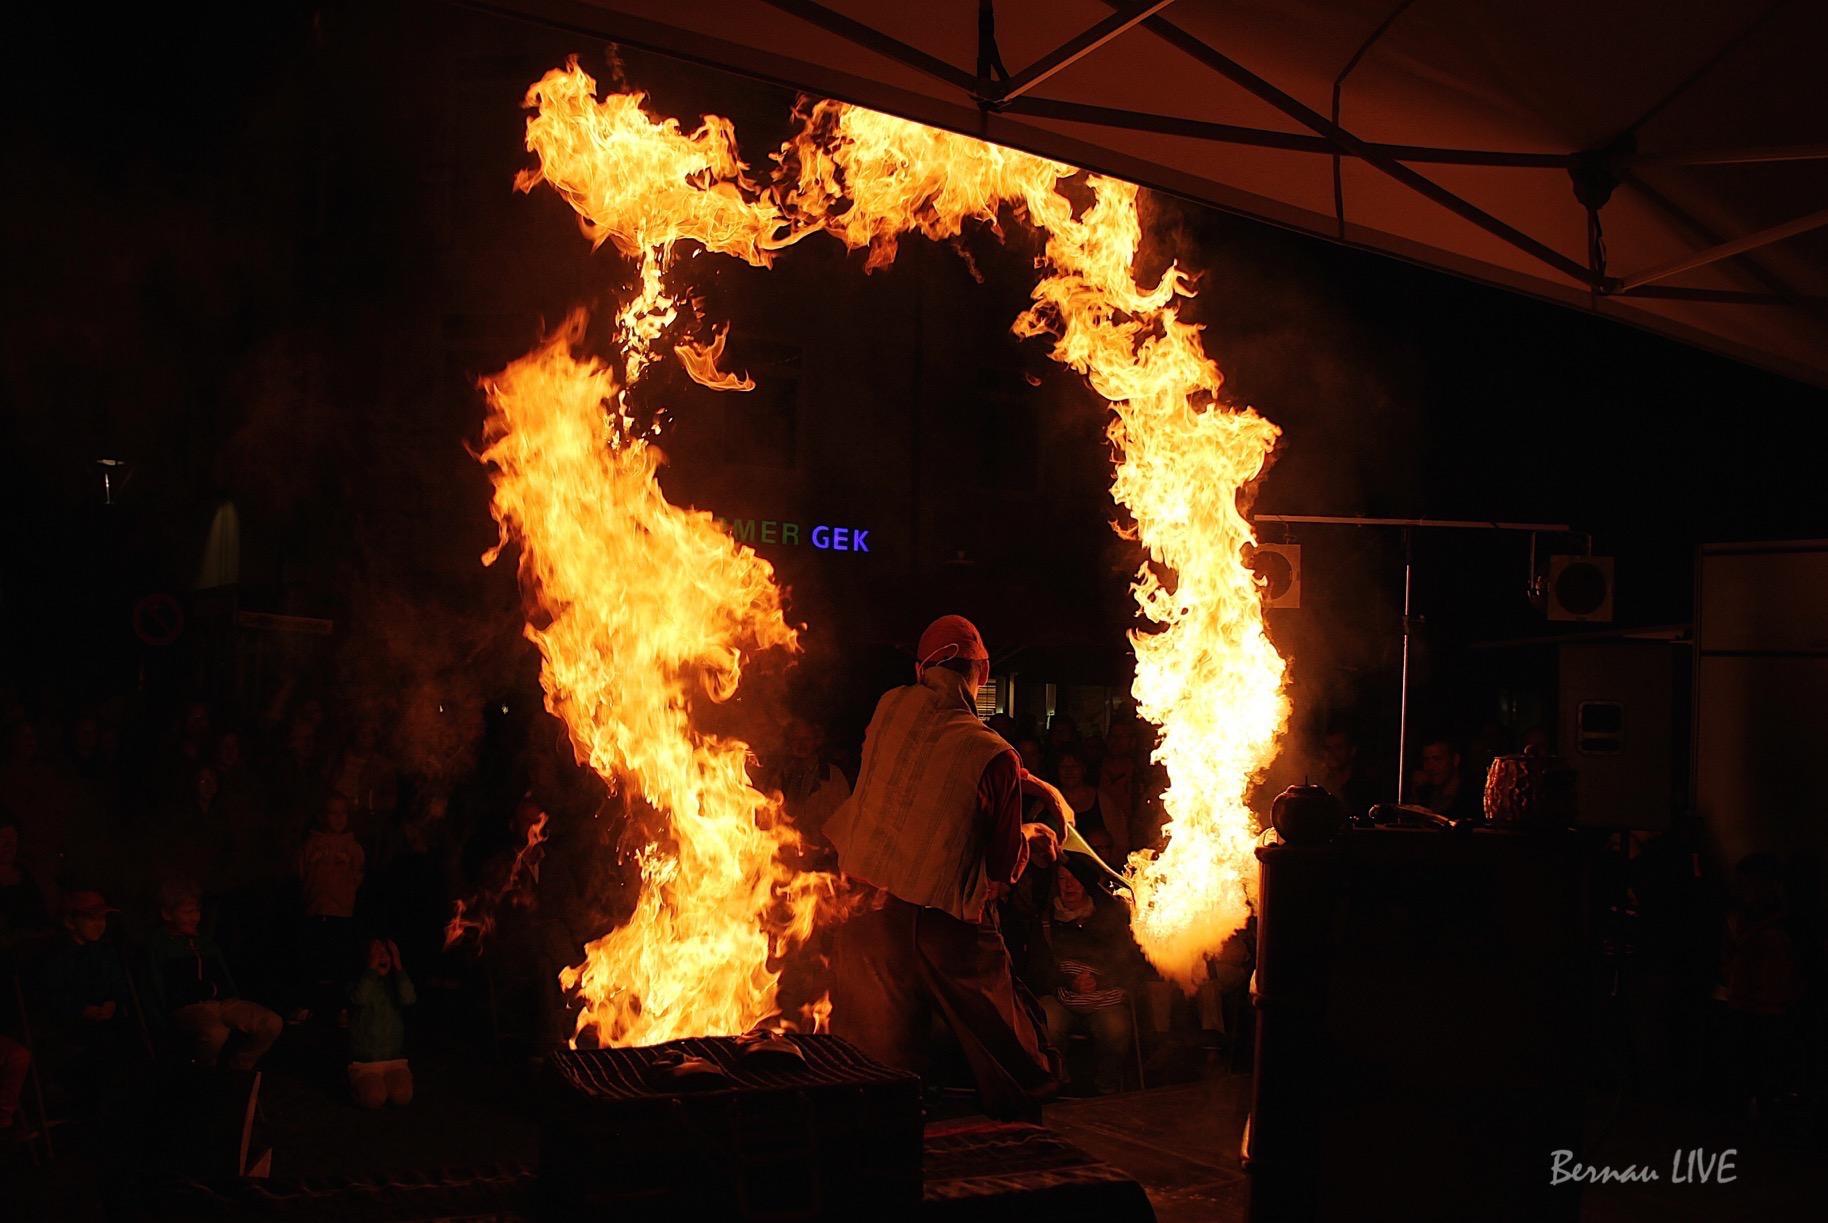 Bernau, Gauklerfest Bernau, Barnim, Bernau LIVE